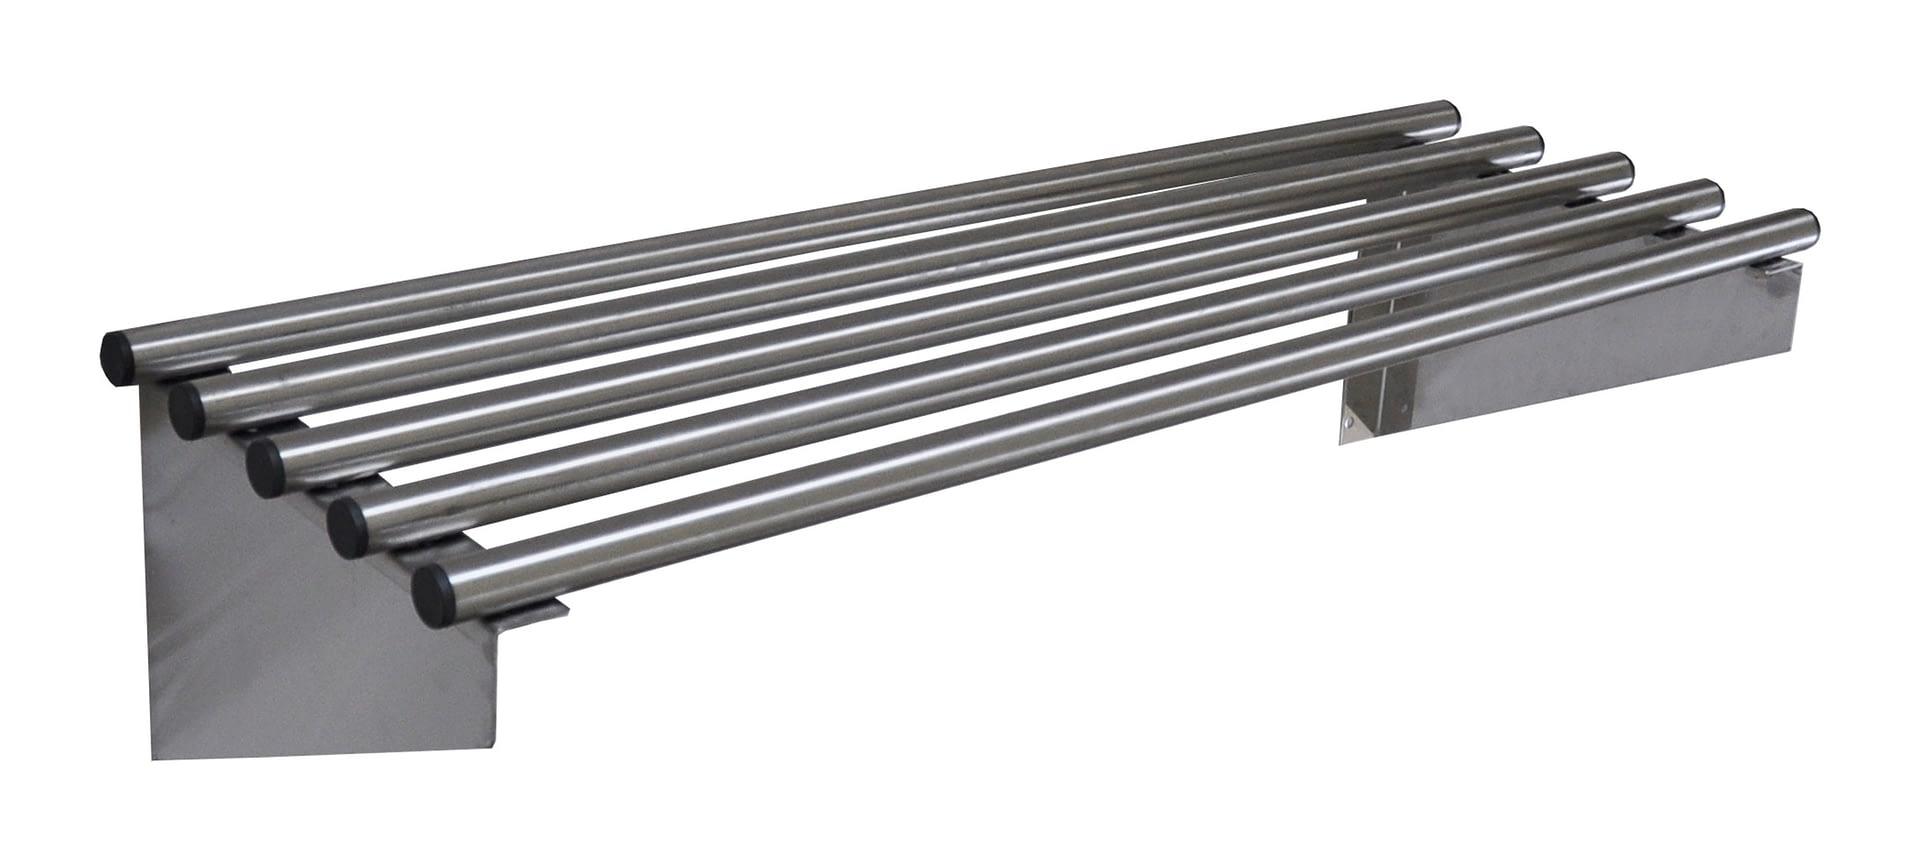 Stainless Steel Pipe Wall Shelf, 900 X 300mm deep